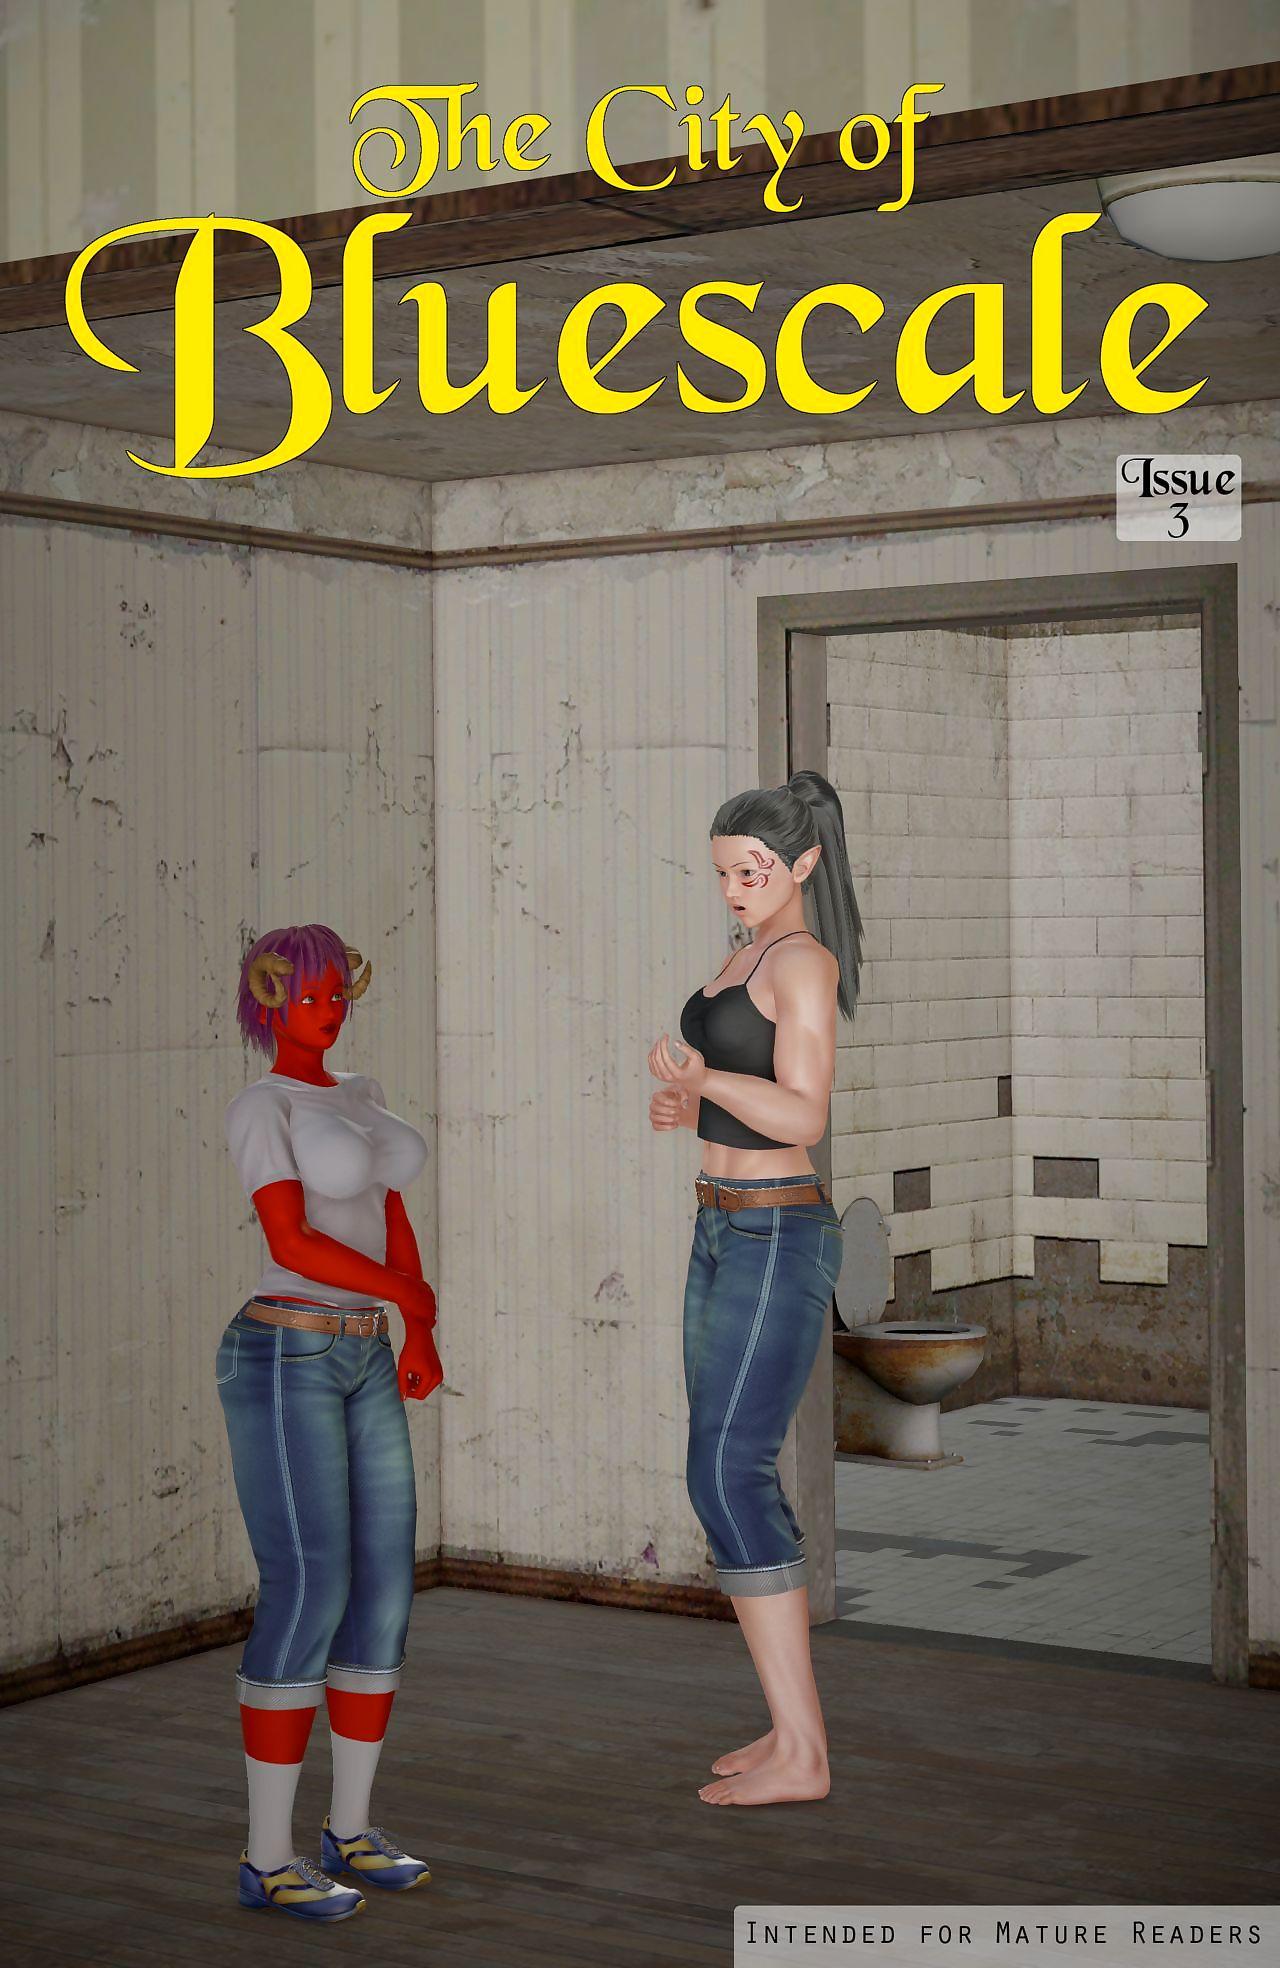 Bluescale Scene 5